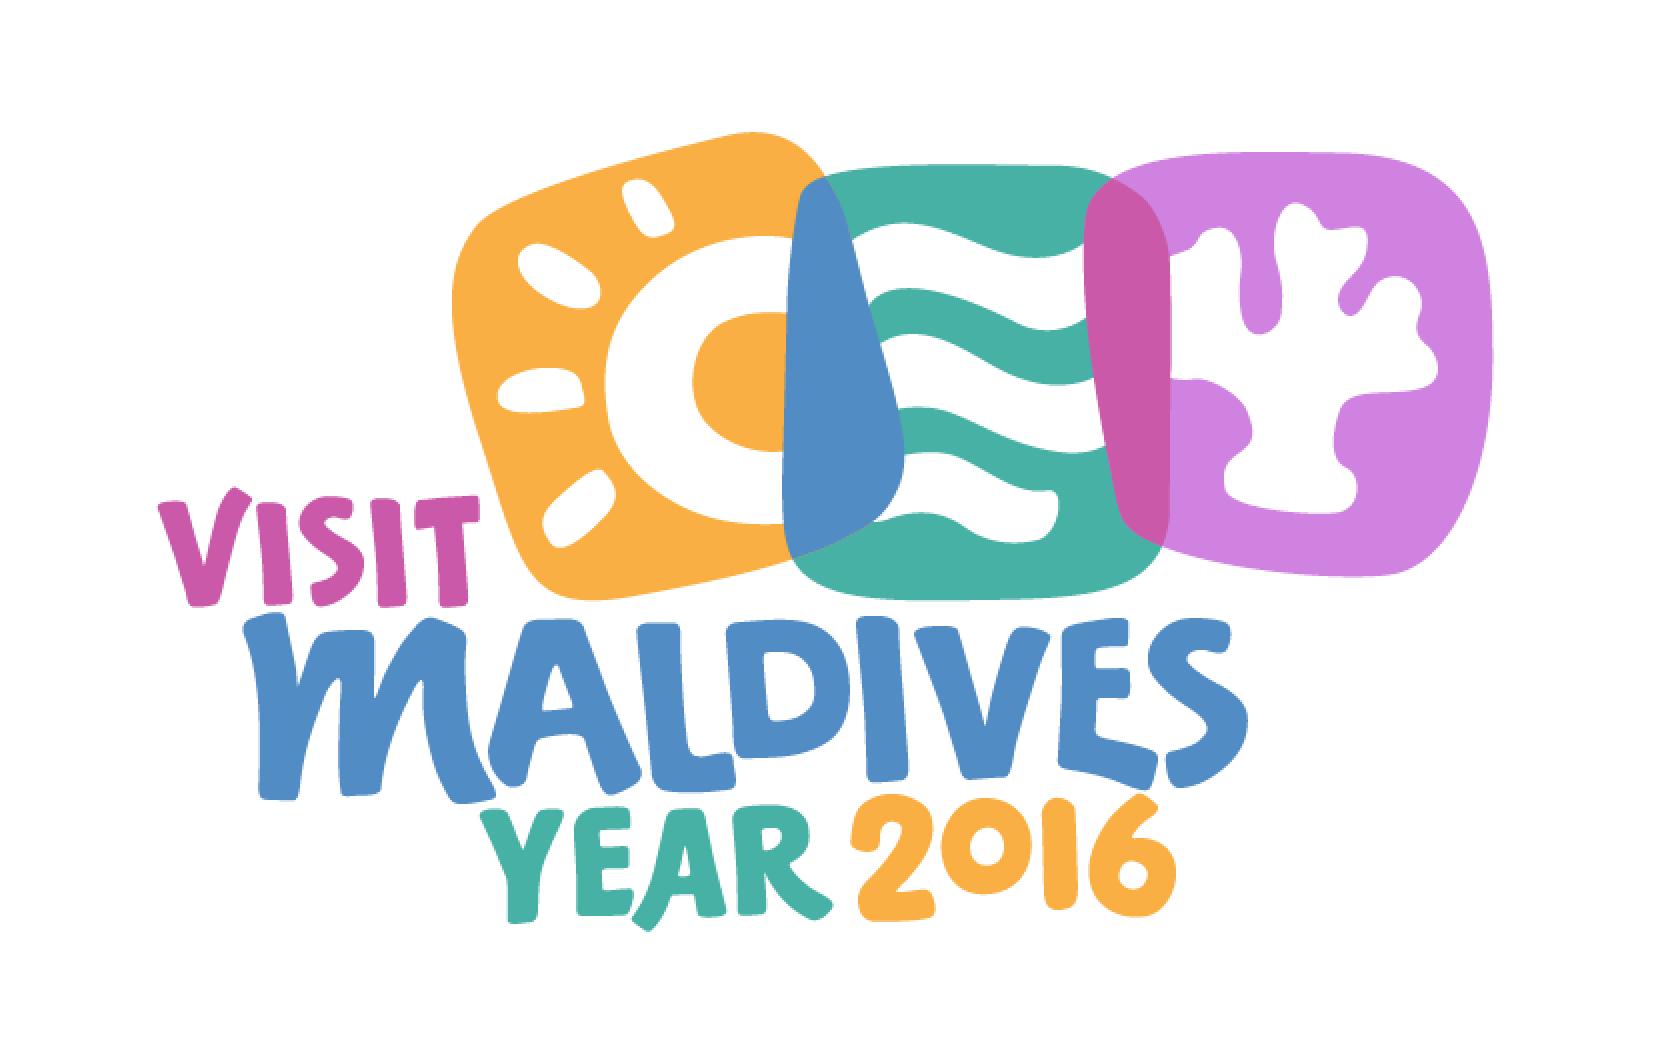 Visit Maldives Year 2016